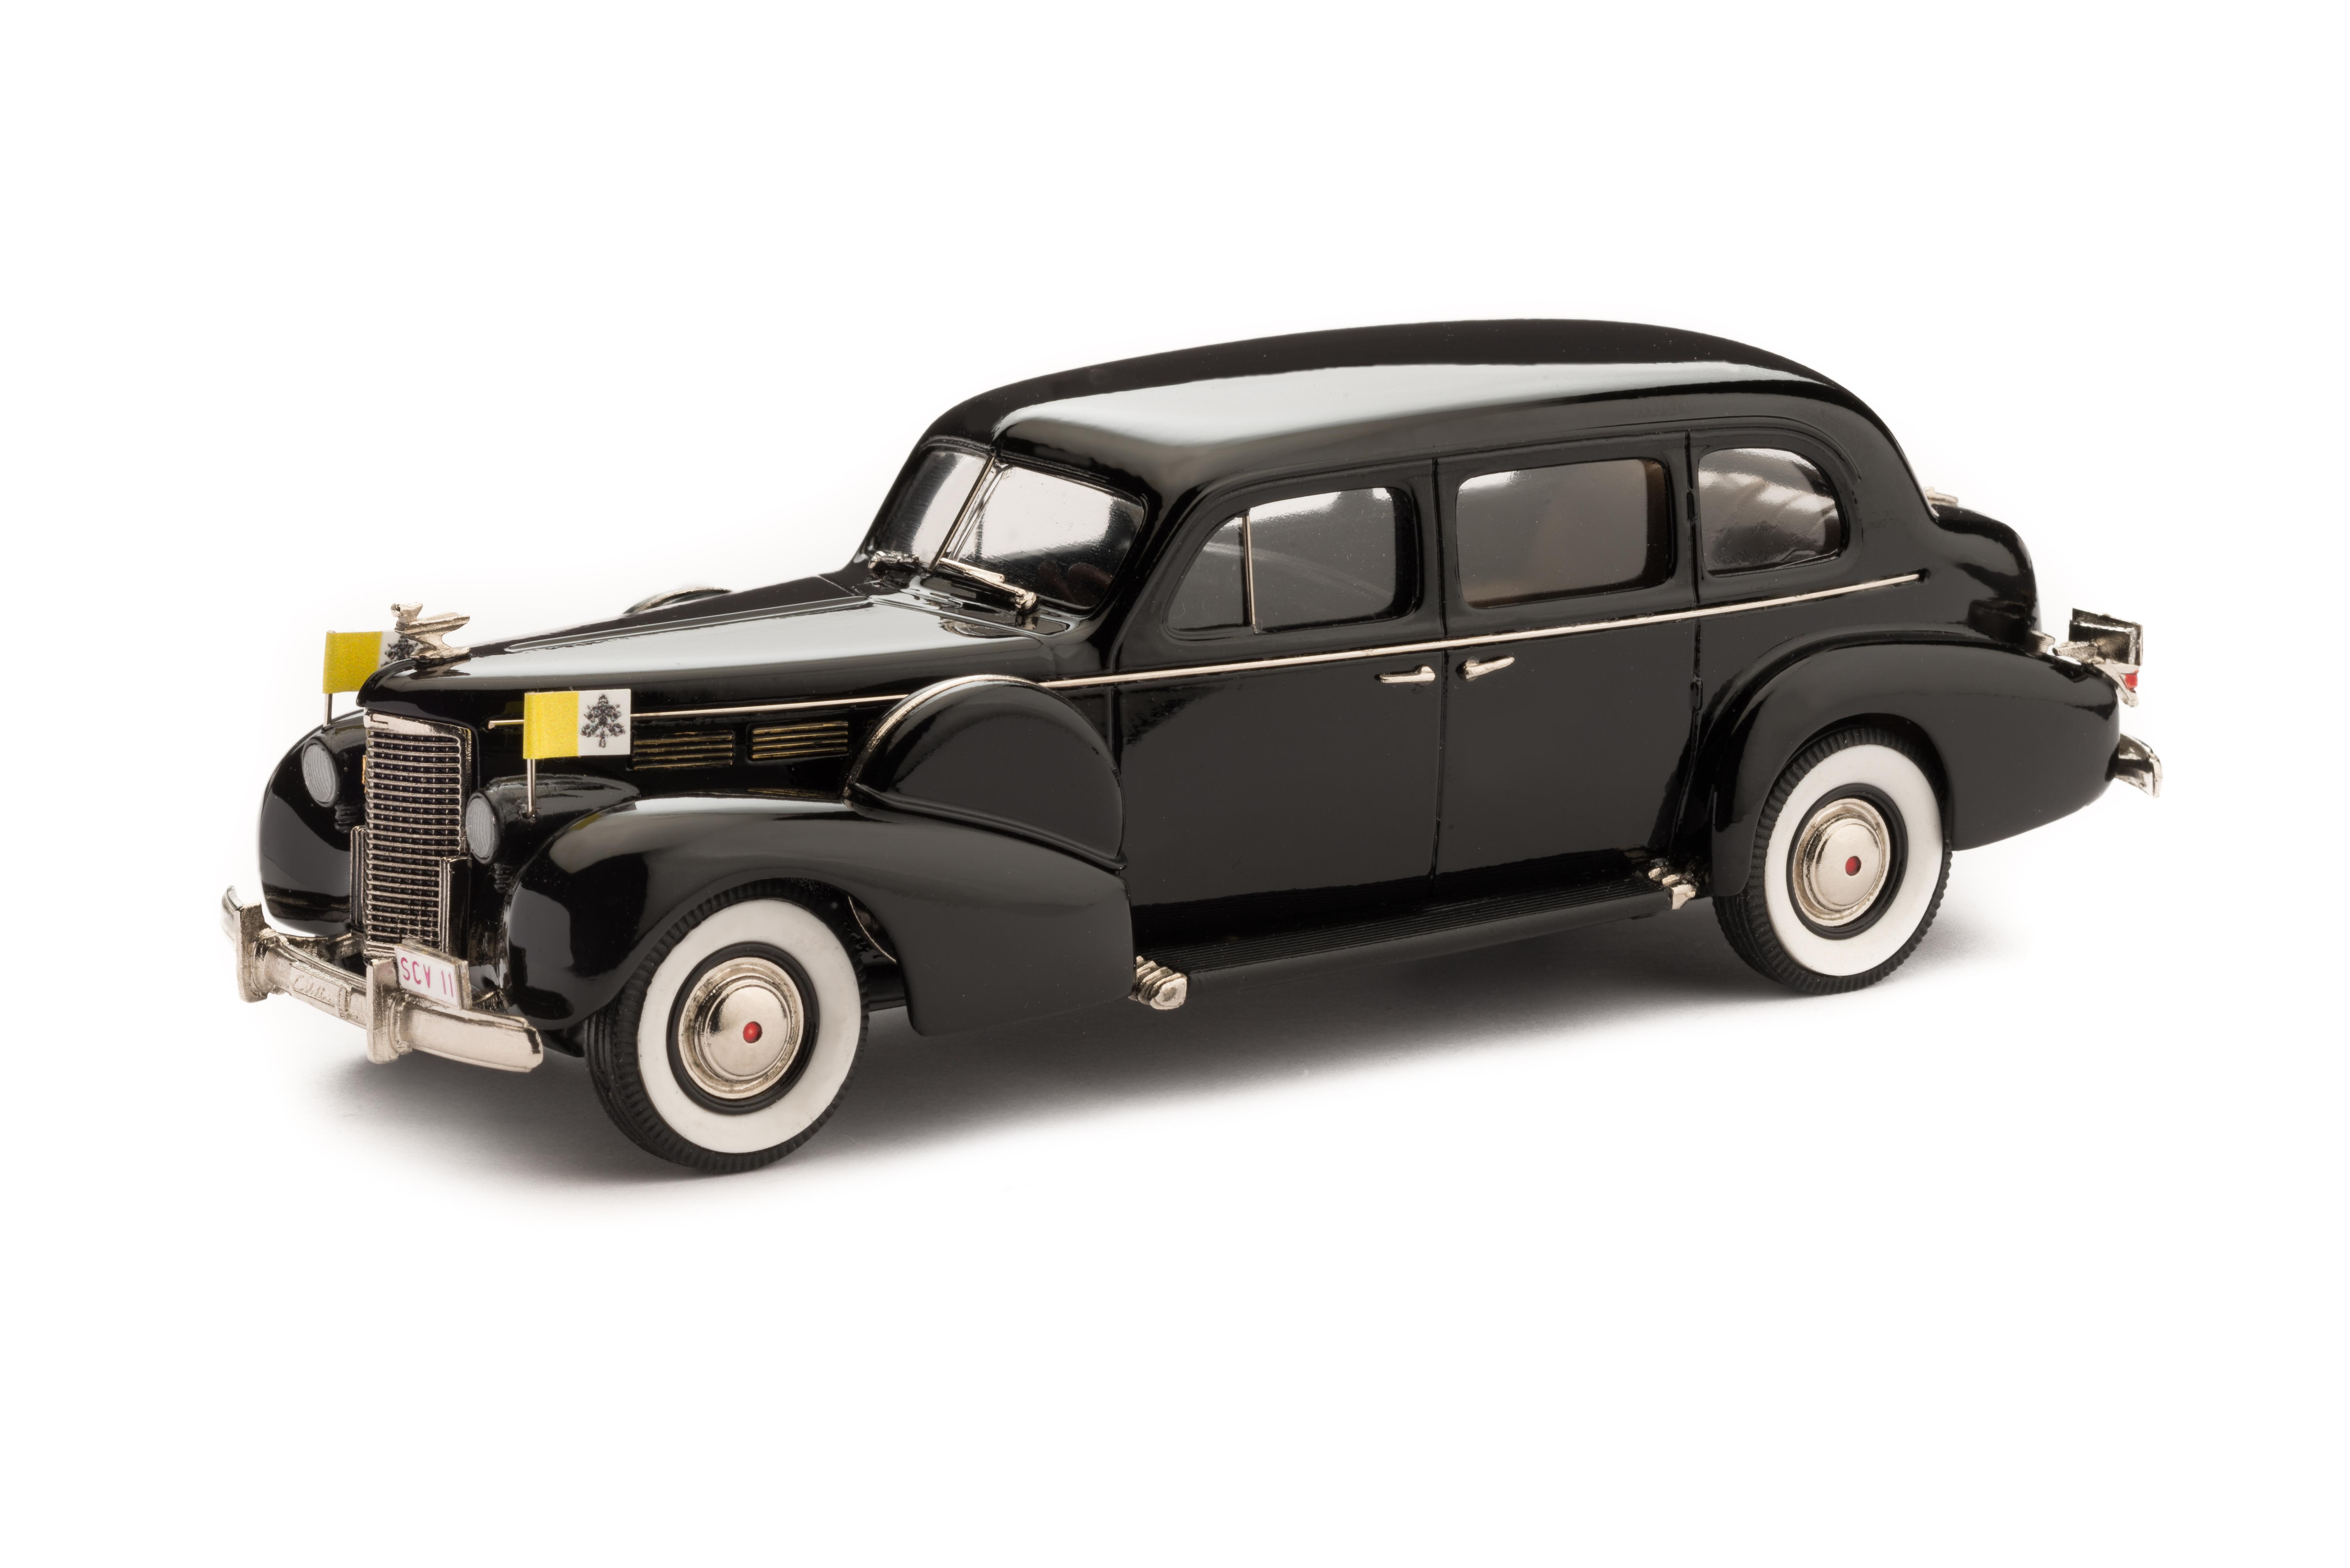 1938 CADILLAC V8 SERIES 75 IMPERIAL